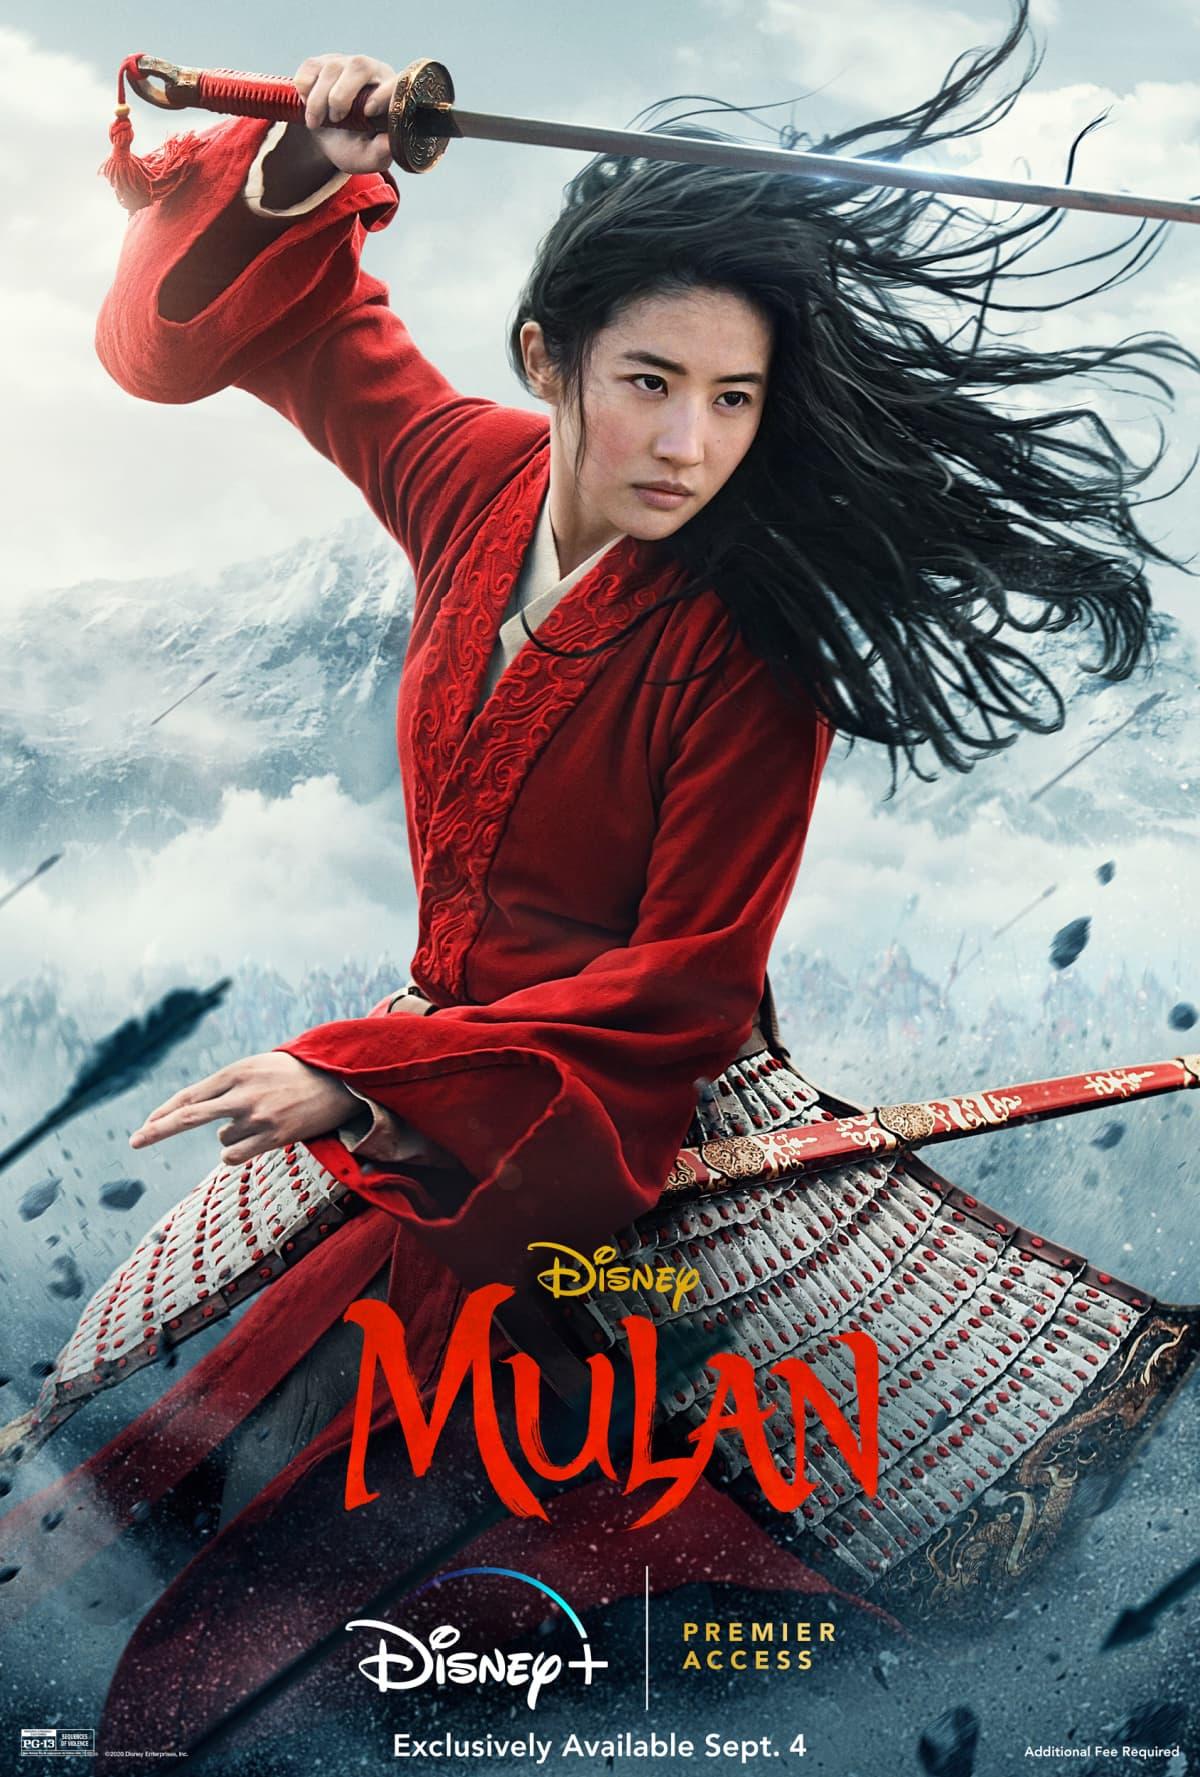 Mulan live action movie poster